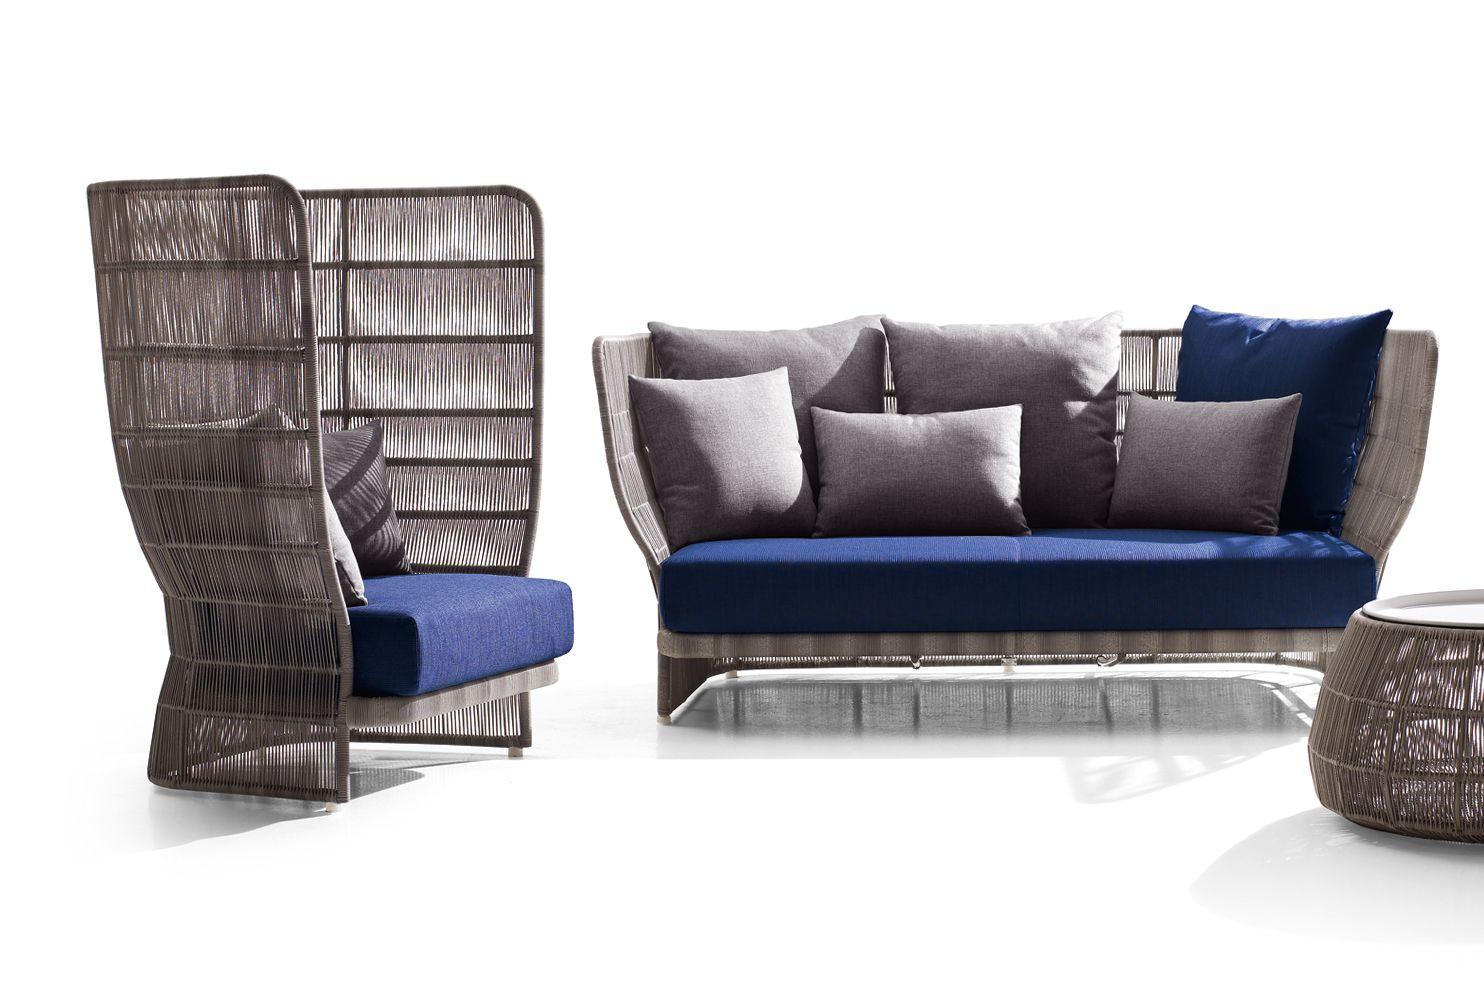 Armchair Canasta 39 13 Collection B Amp B Italia Outdoor Design Patricia Urquiola Outdoor Sofa Outdoor Furniture Furniture